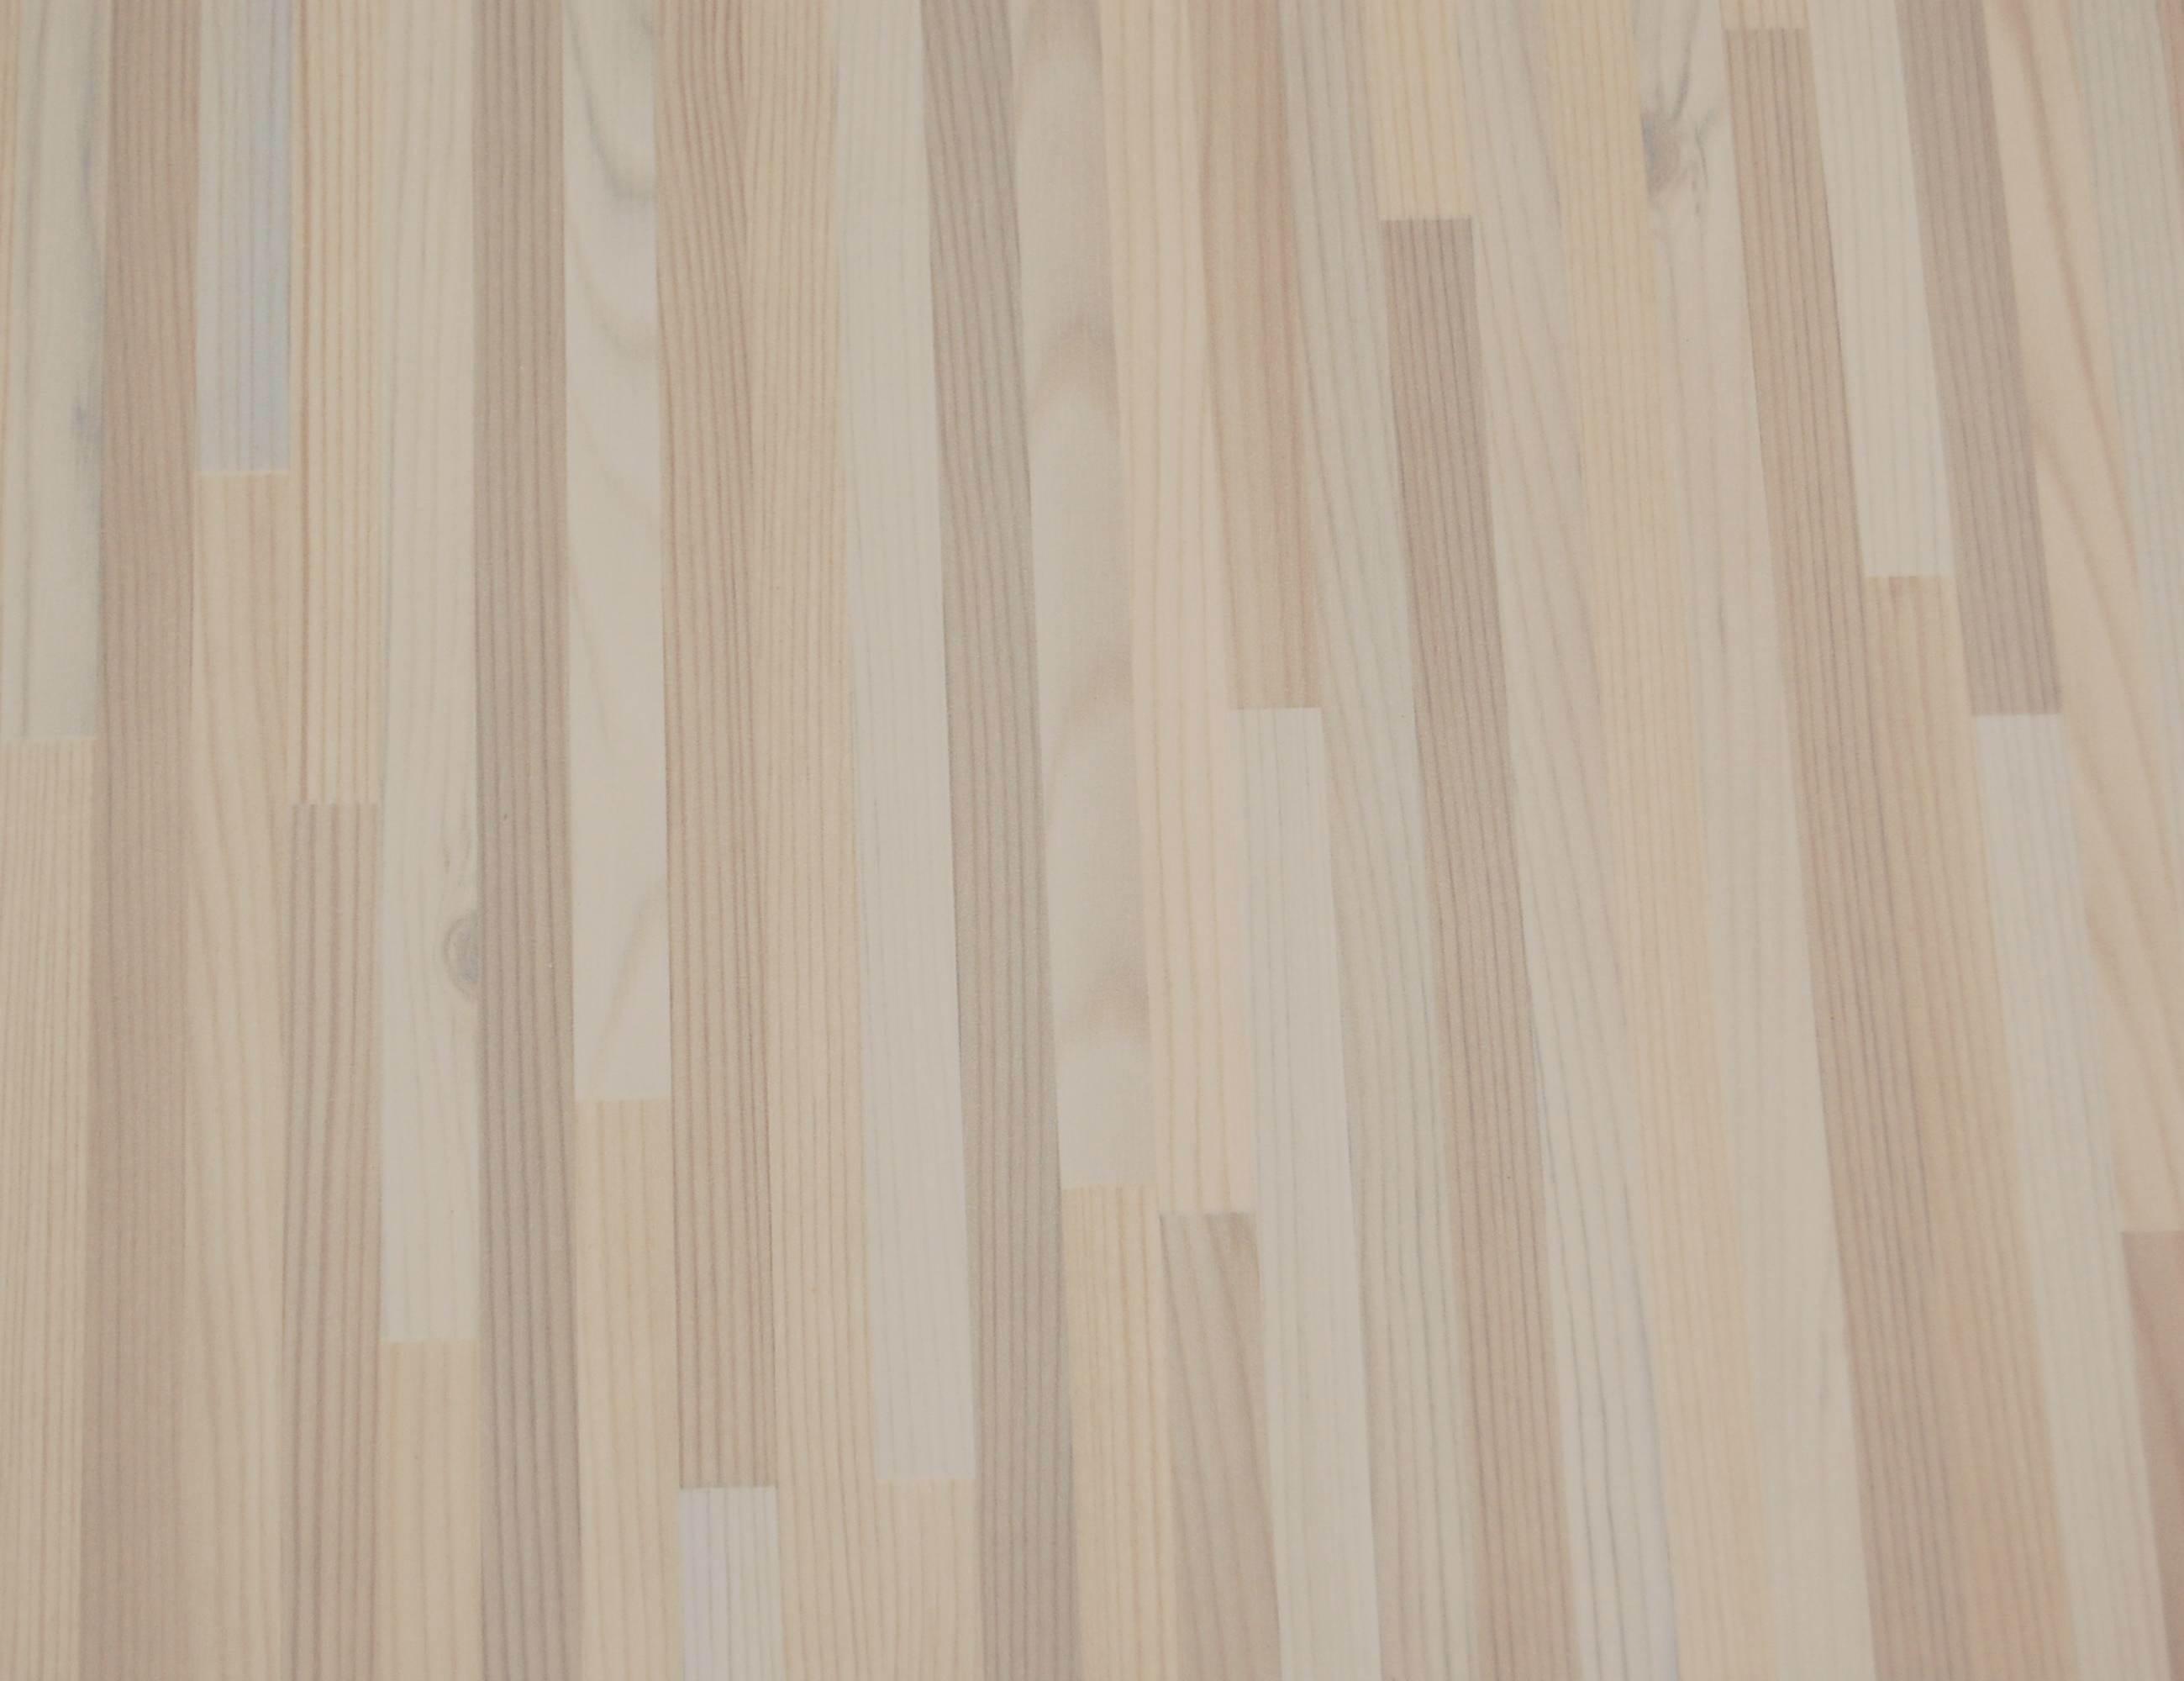 Laminate flooring wilsonart laminate flooring for Hd laminate flooring